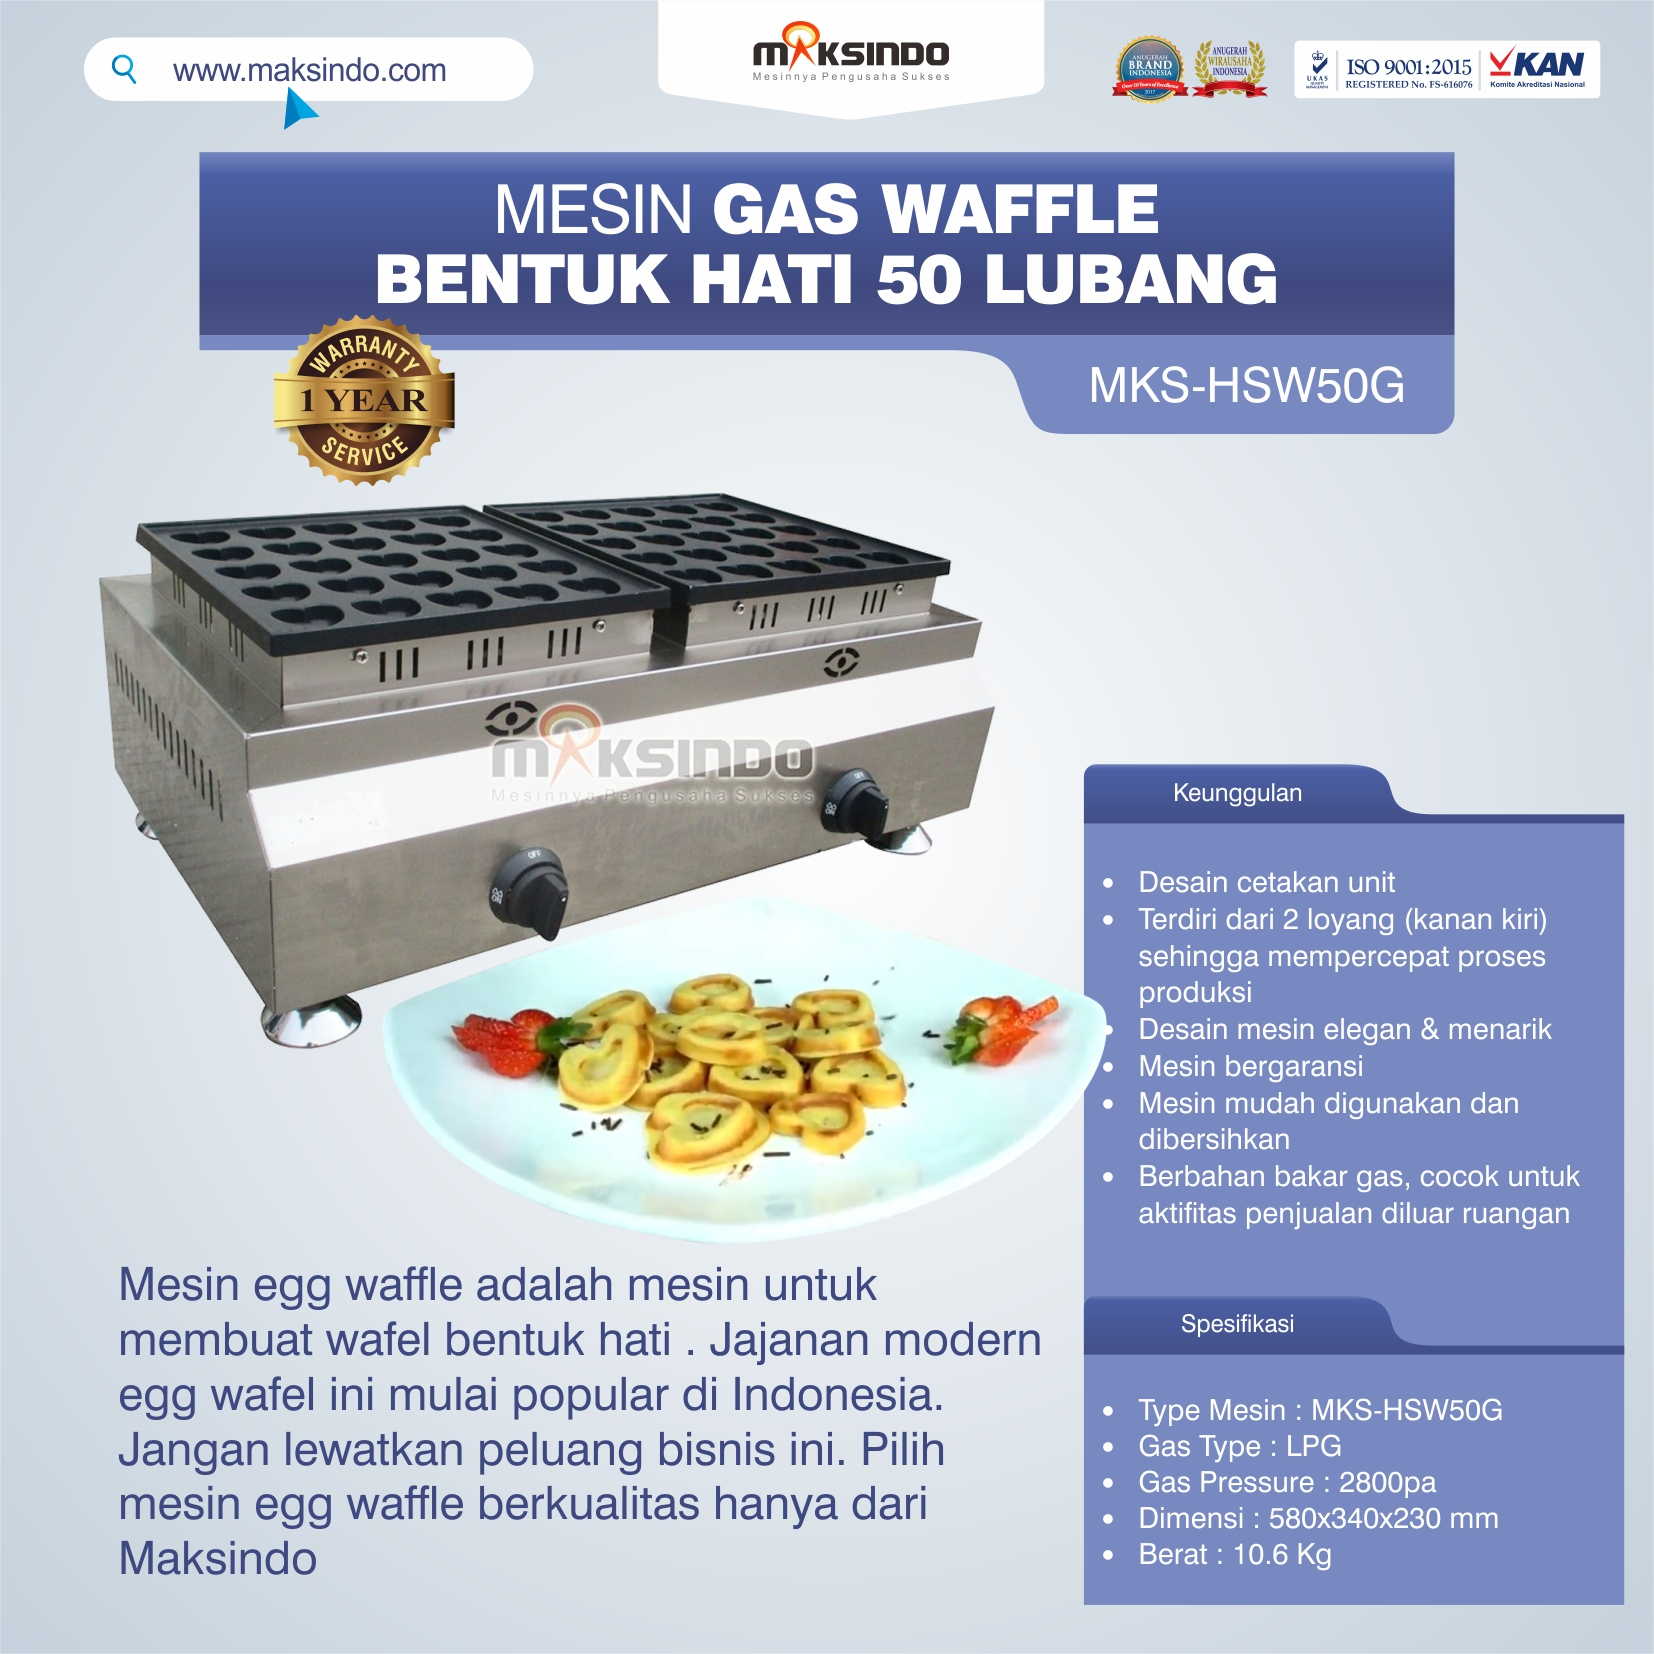 Mesin Waffle Gas Bentuk Hati 50 Lubang MKS-HSW50G